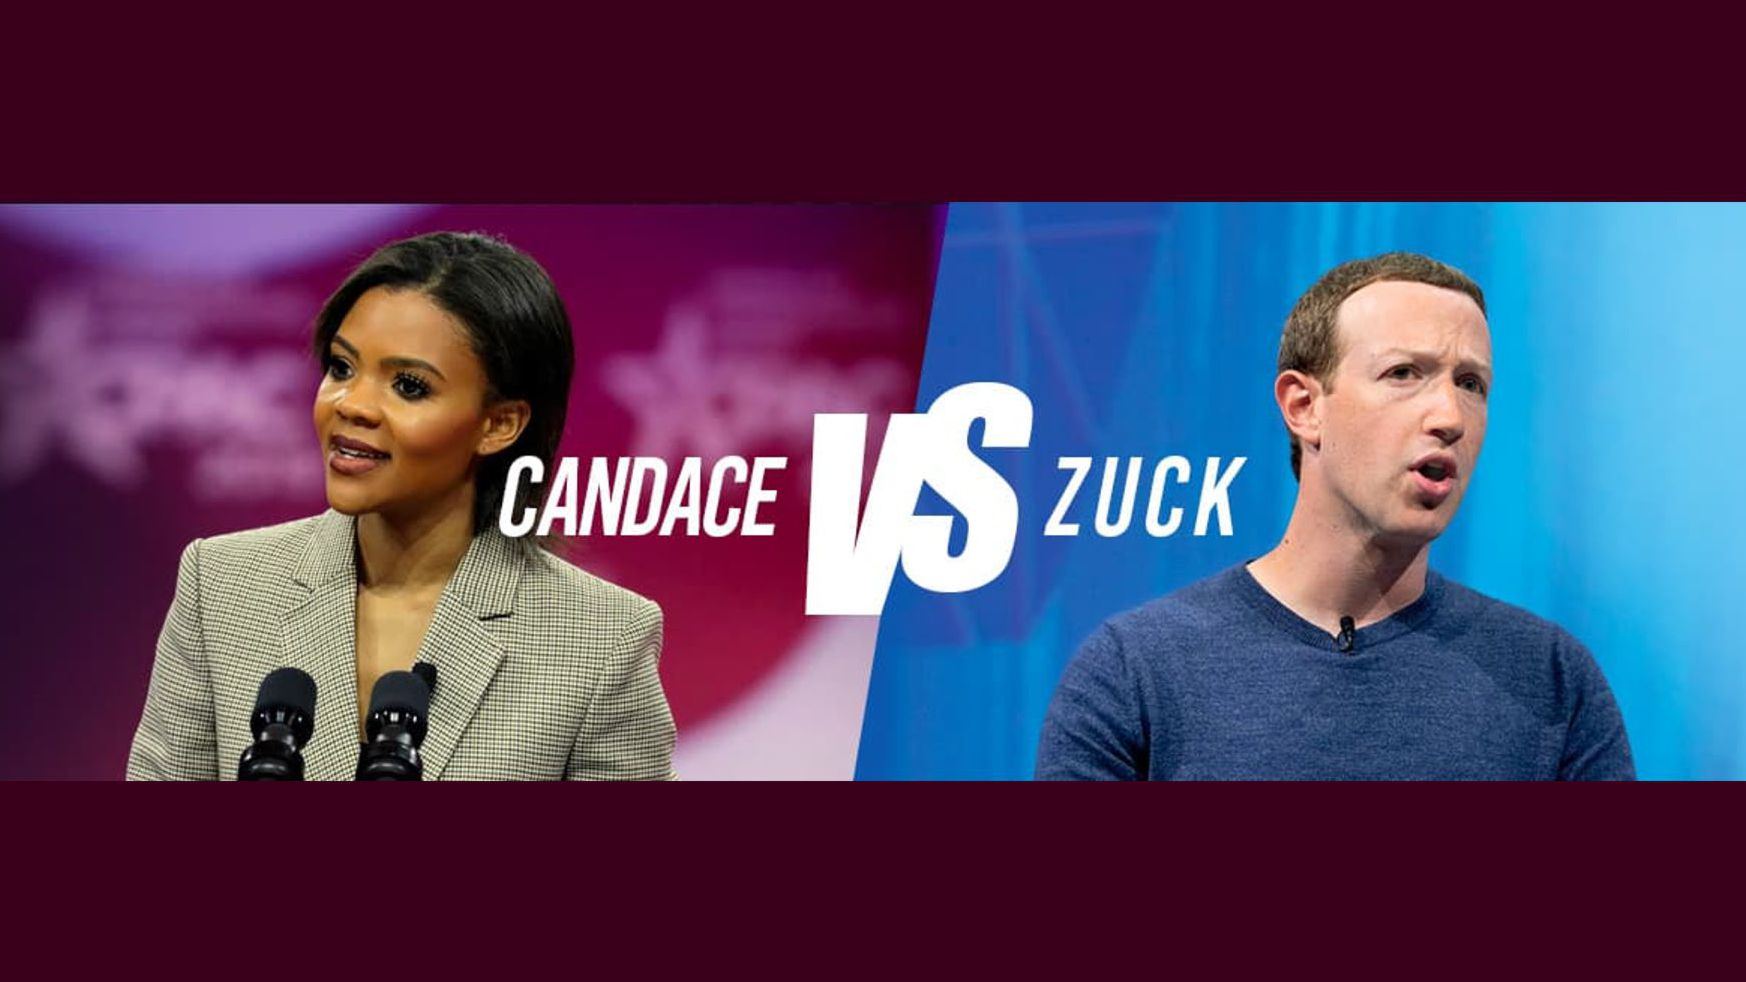 Candace Owens vs Mark Zuckerberg